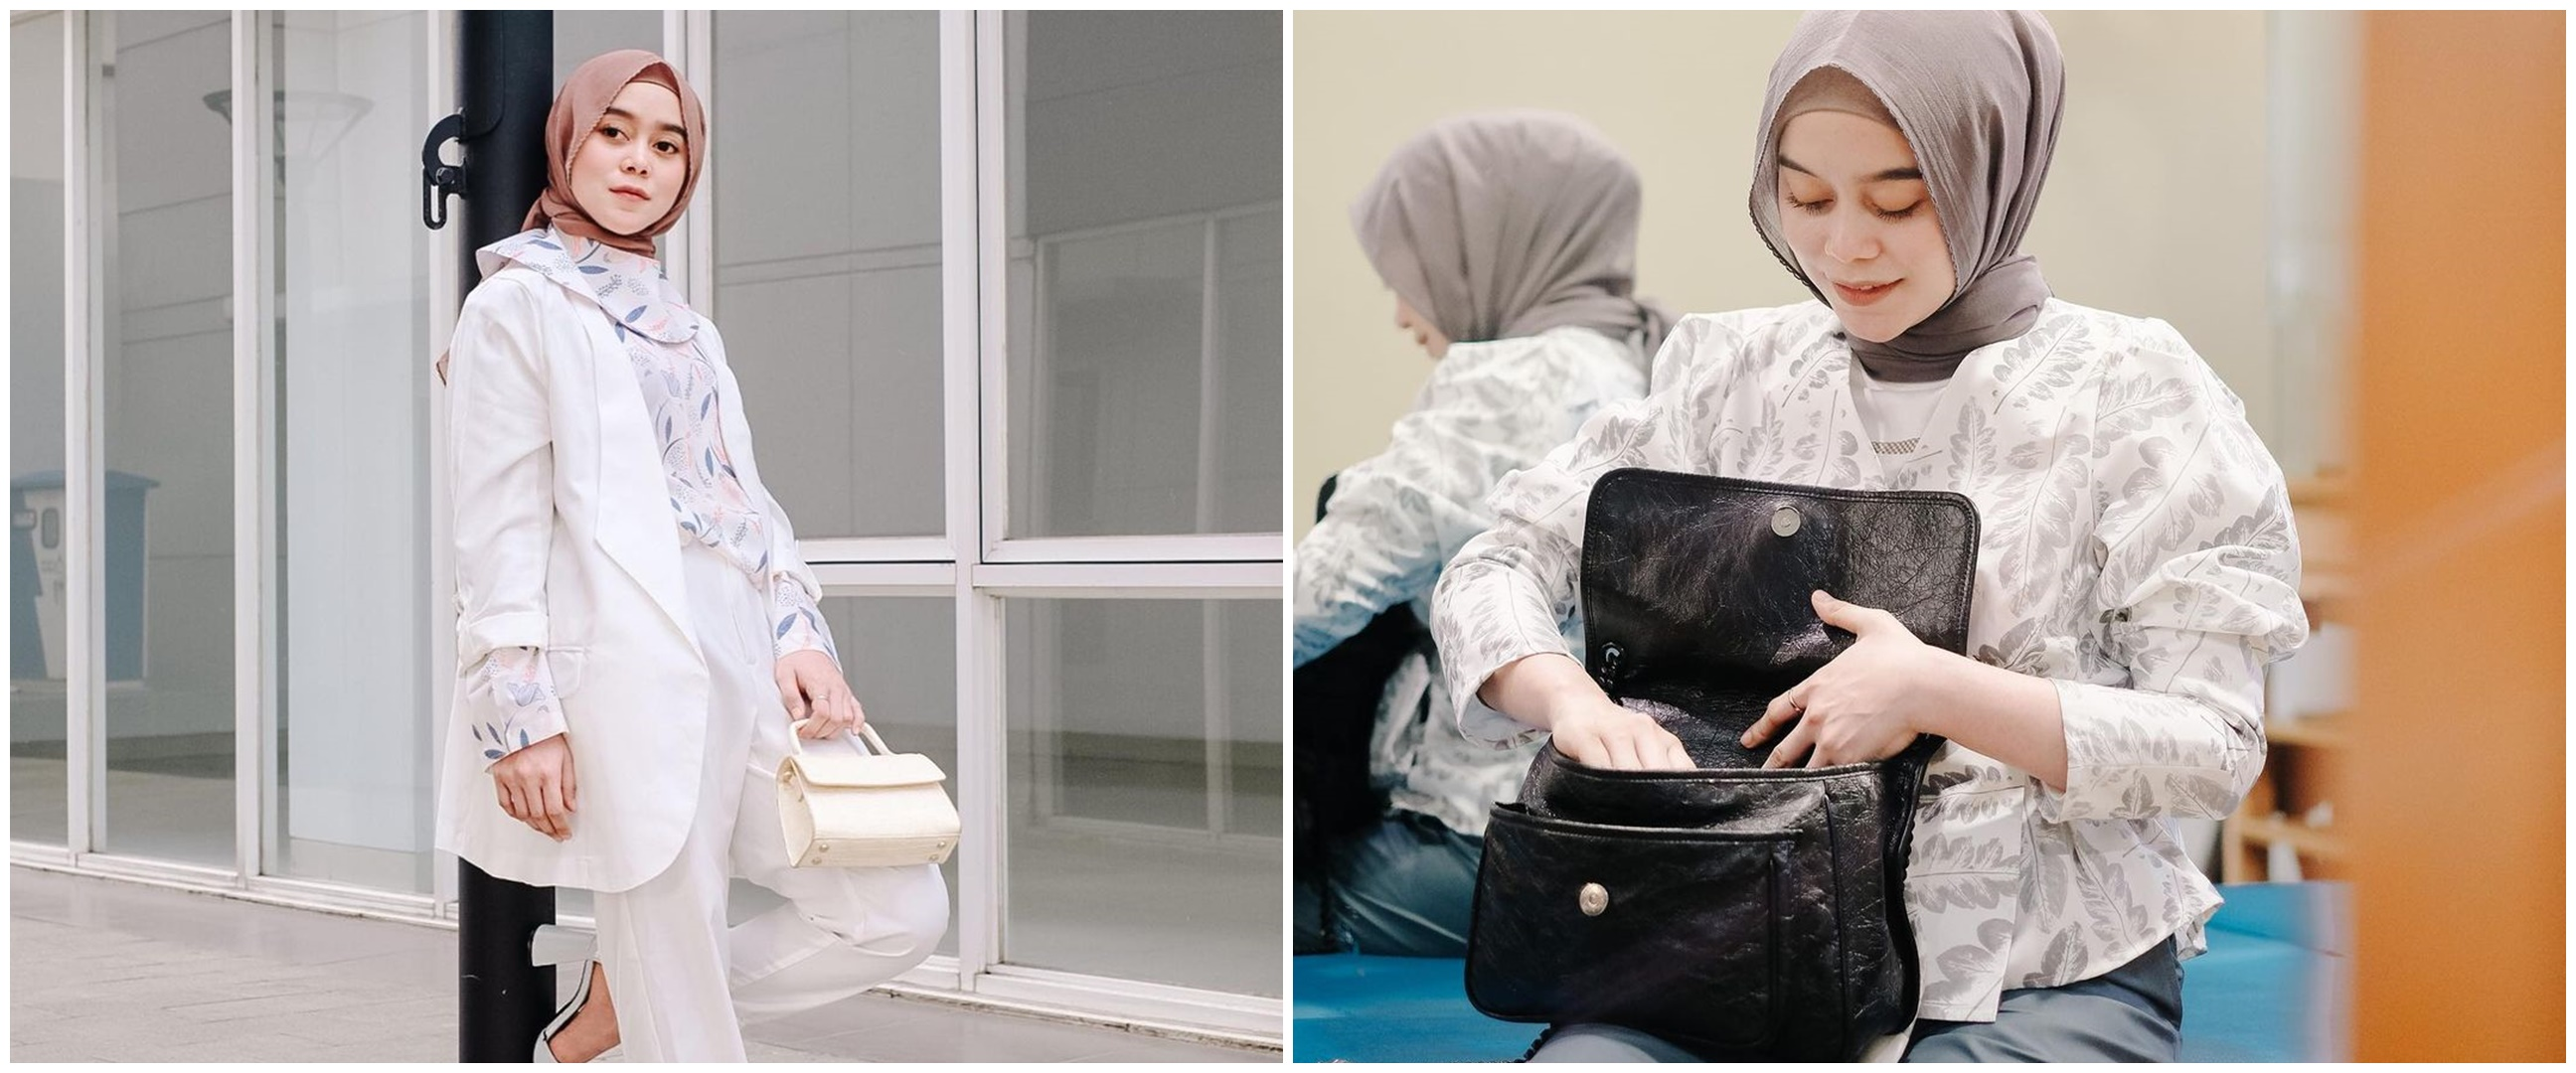 10 Taksiran harga fashion item Lesty Kejora, gaunnya bikin melongo